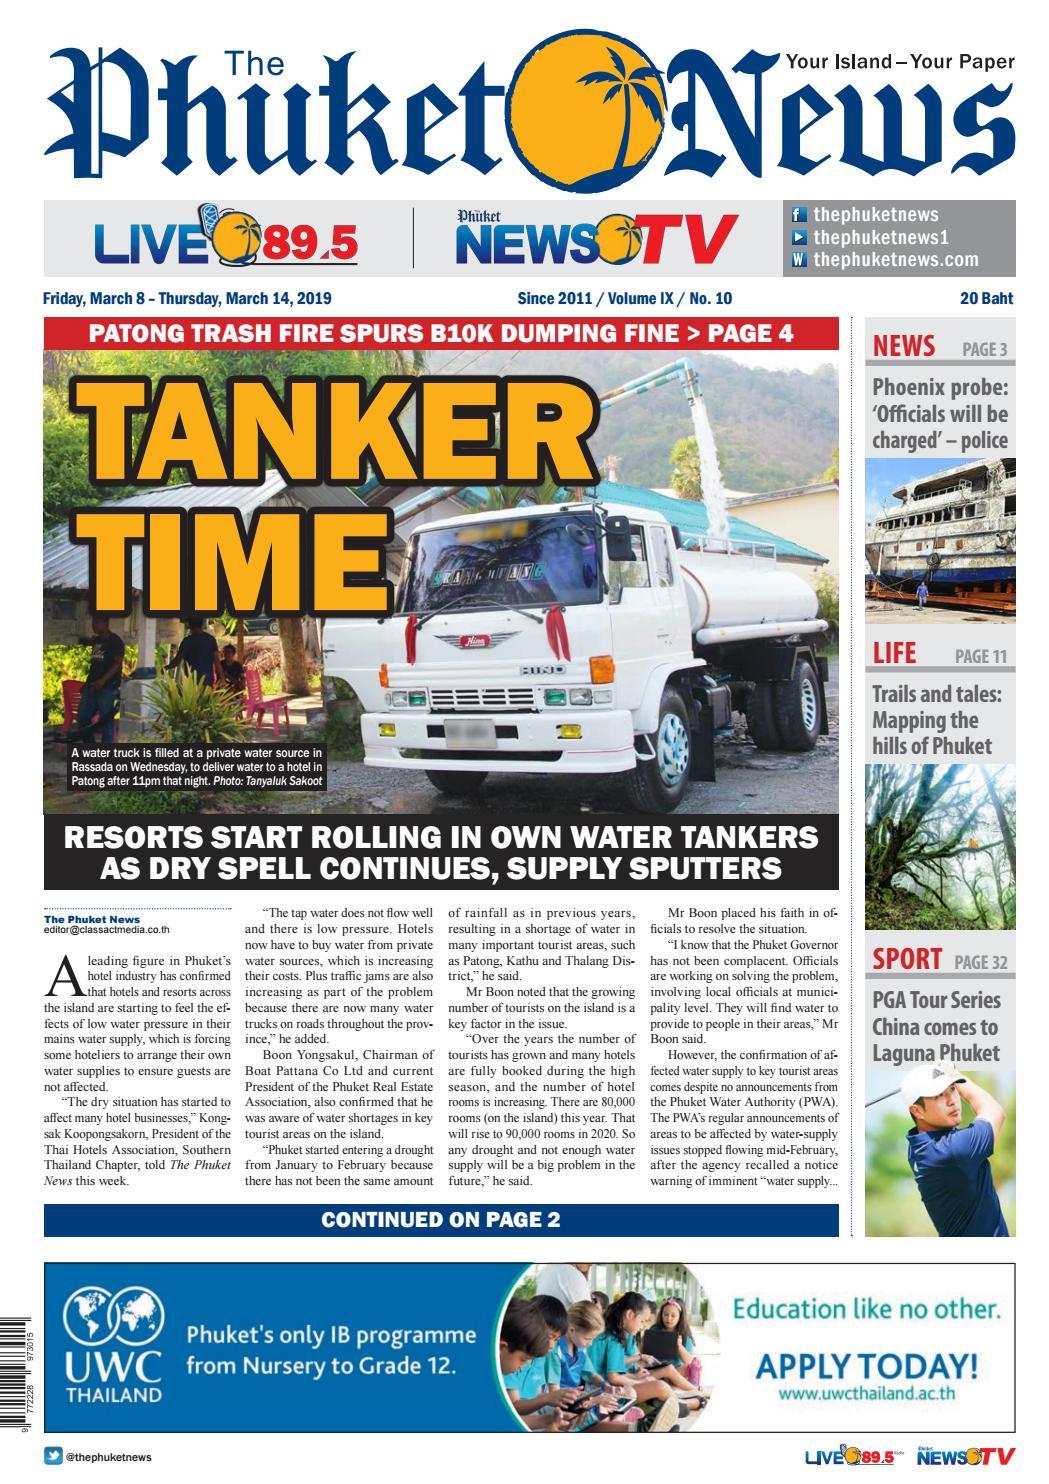 The Phuket News 08 March 2019 by The Phuket News - issuu